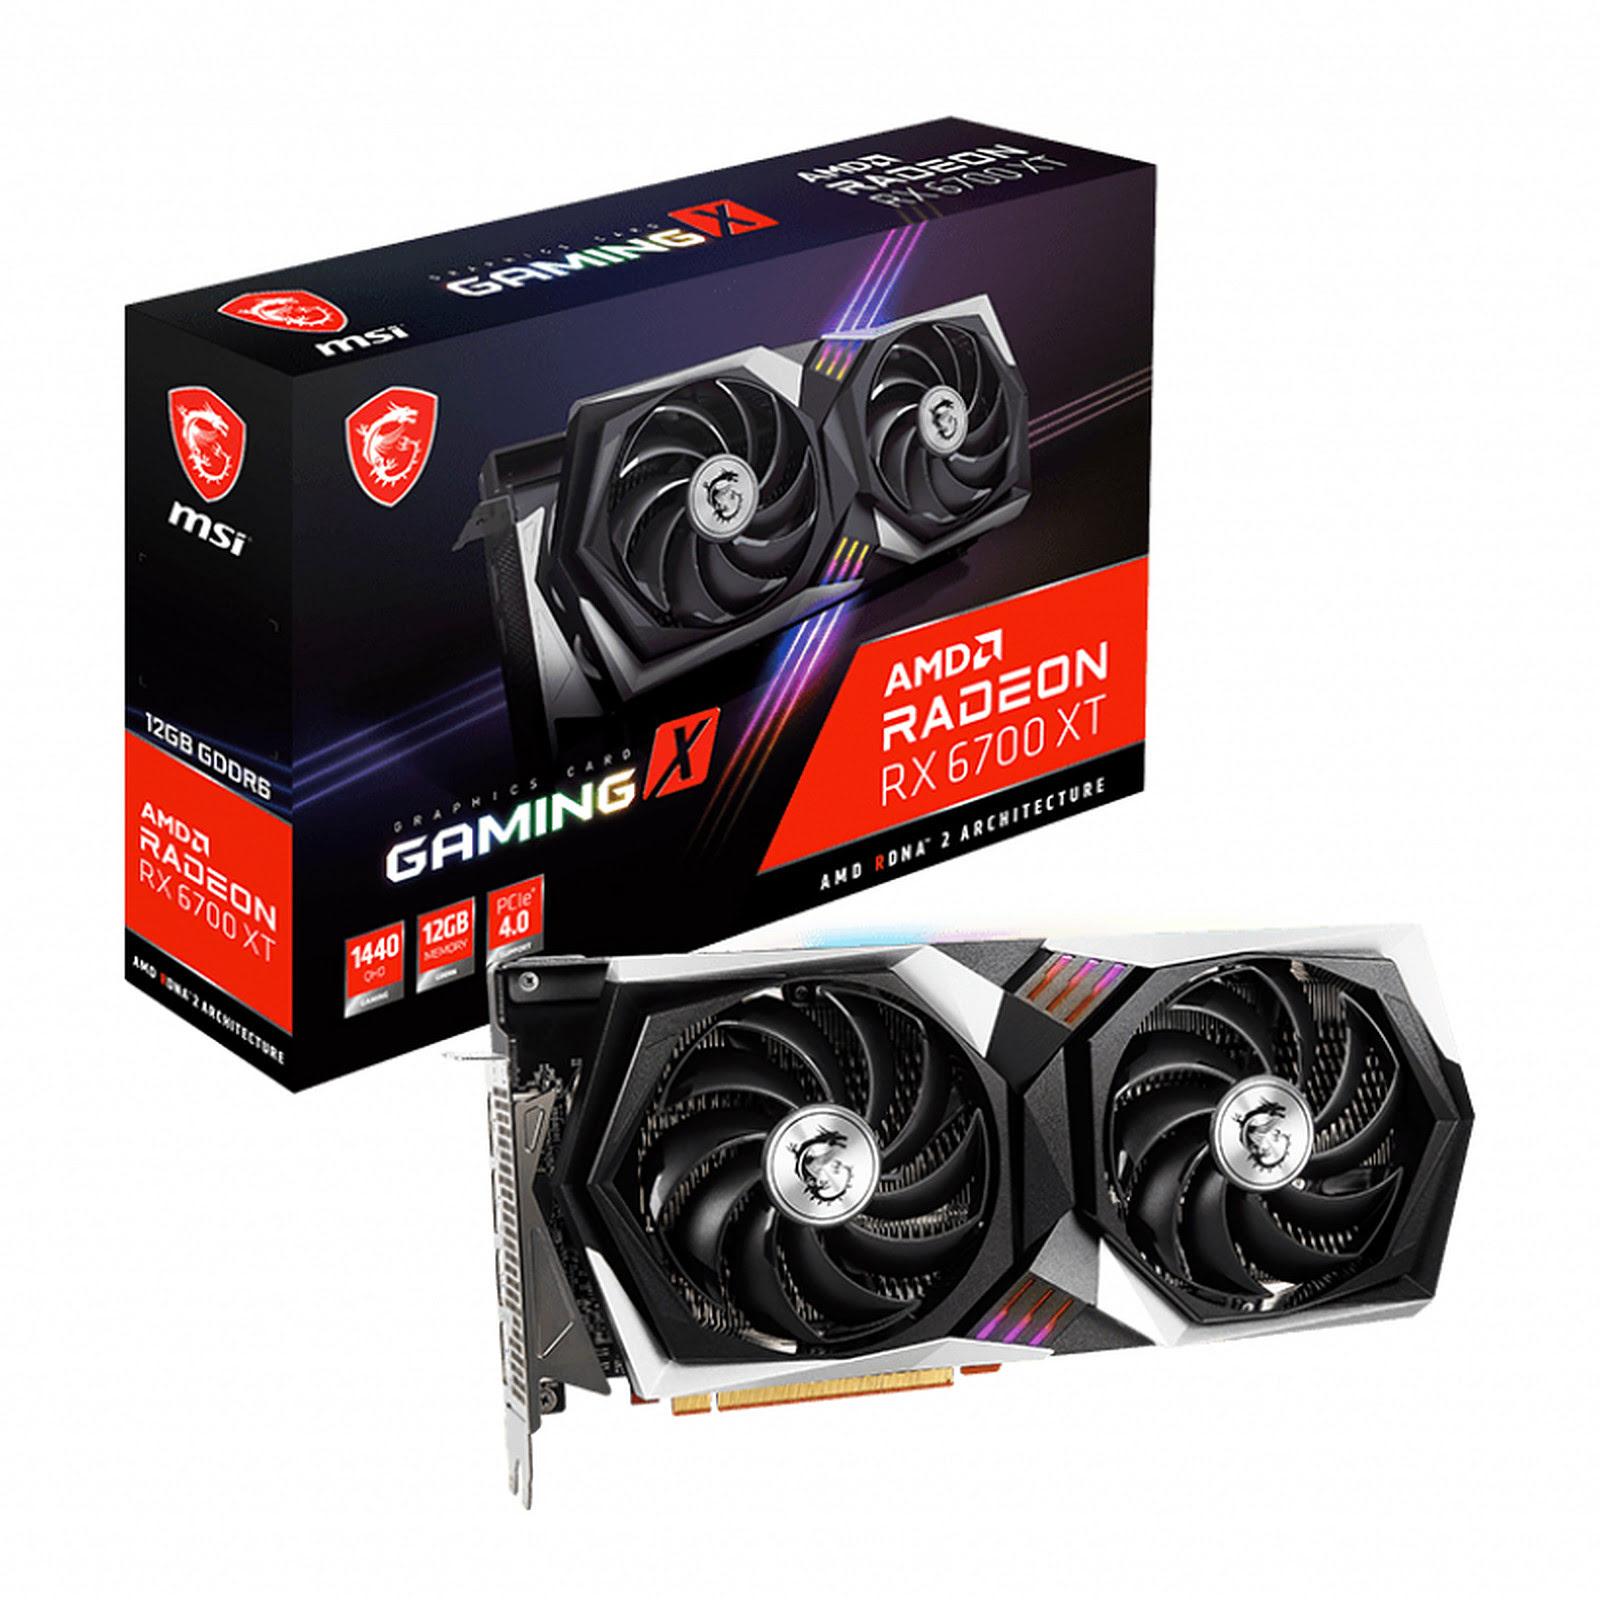 Radeon RX 6700 XT GAMING X 12G (912-V398-007) - Achat / Vente Carte graphique sur Picata.fr - 0